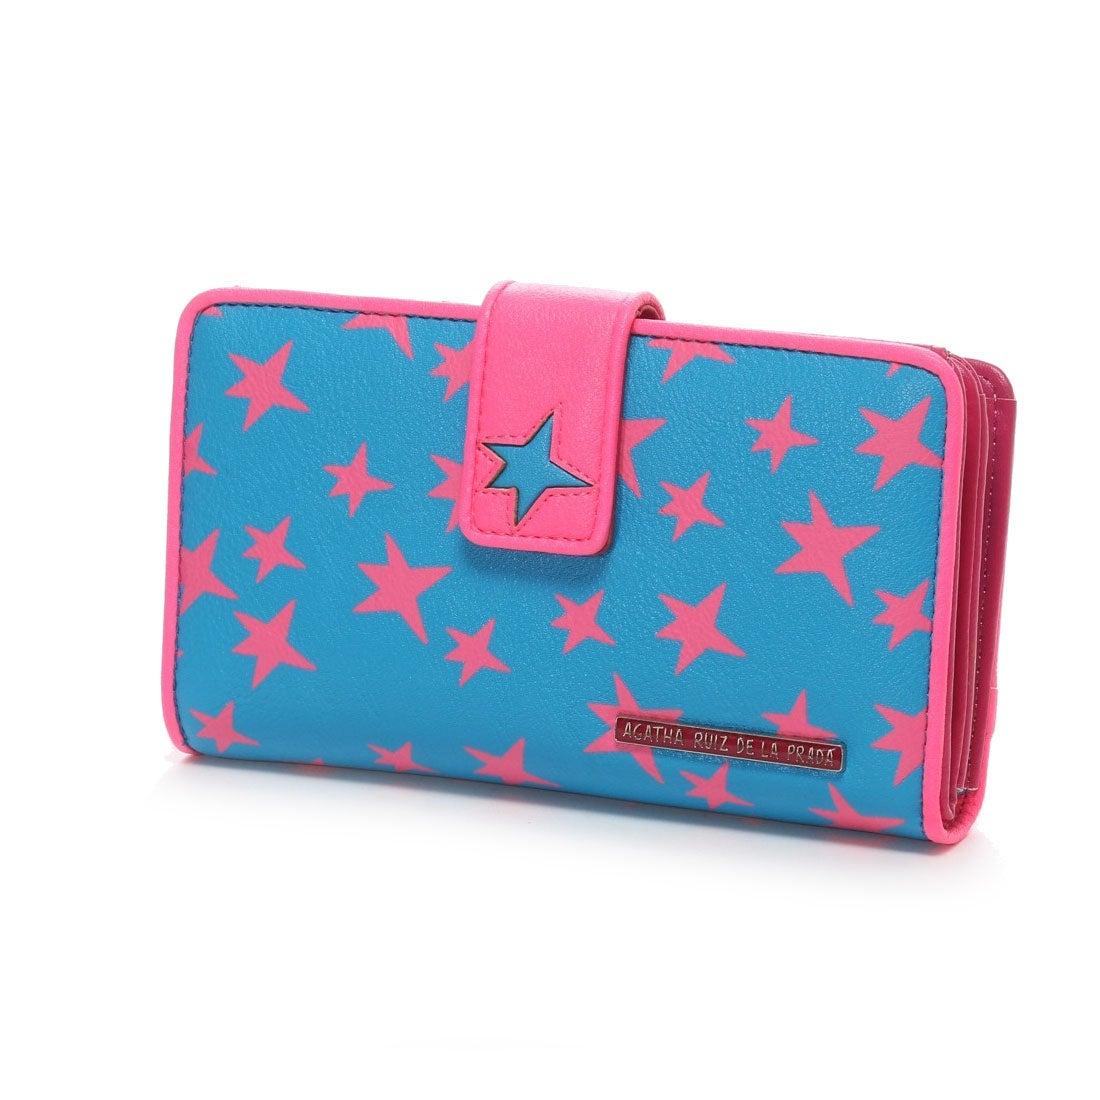 52135044d61e アガタ ルイス デ ラ プラダ AGATHA RUIZ DE LA PRADA 星大容量財布(ブルー) -アウトレット通販 ロコレット  (LOCOLET)